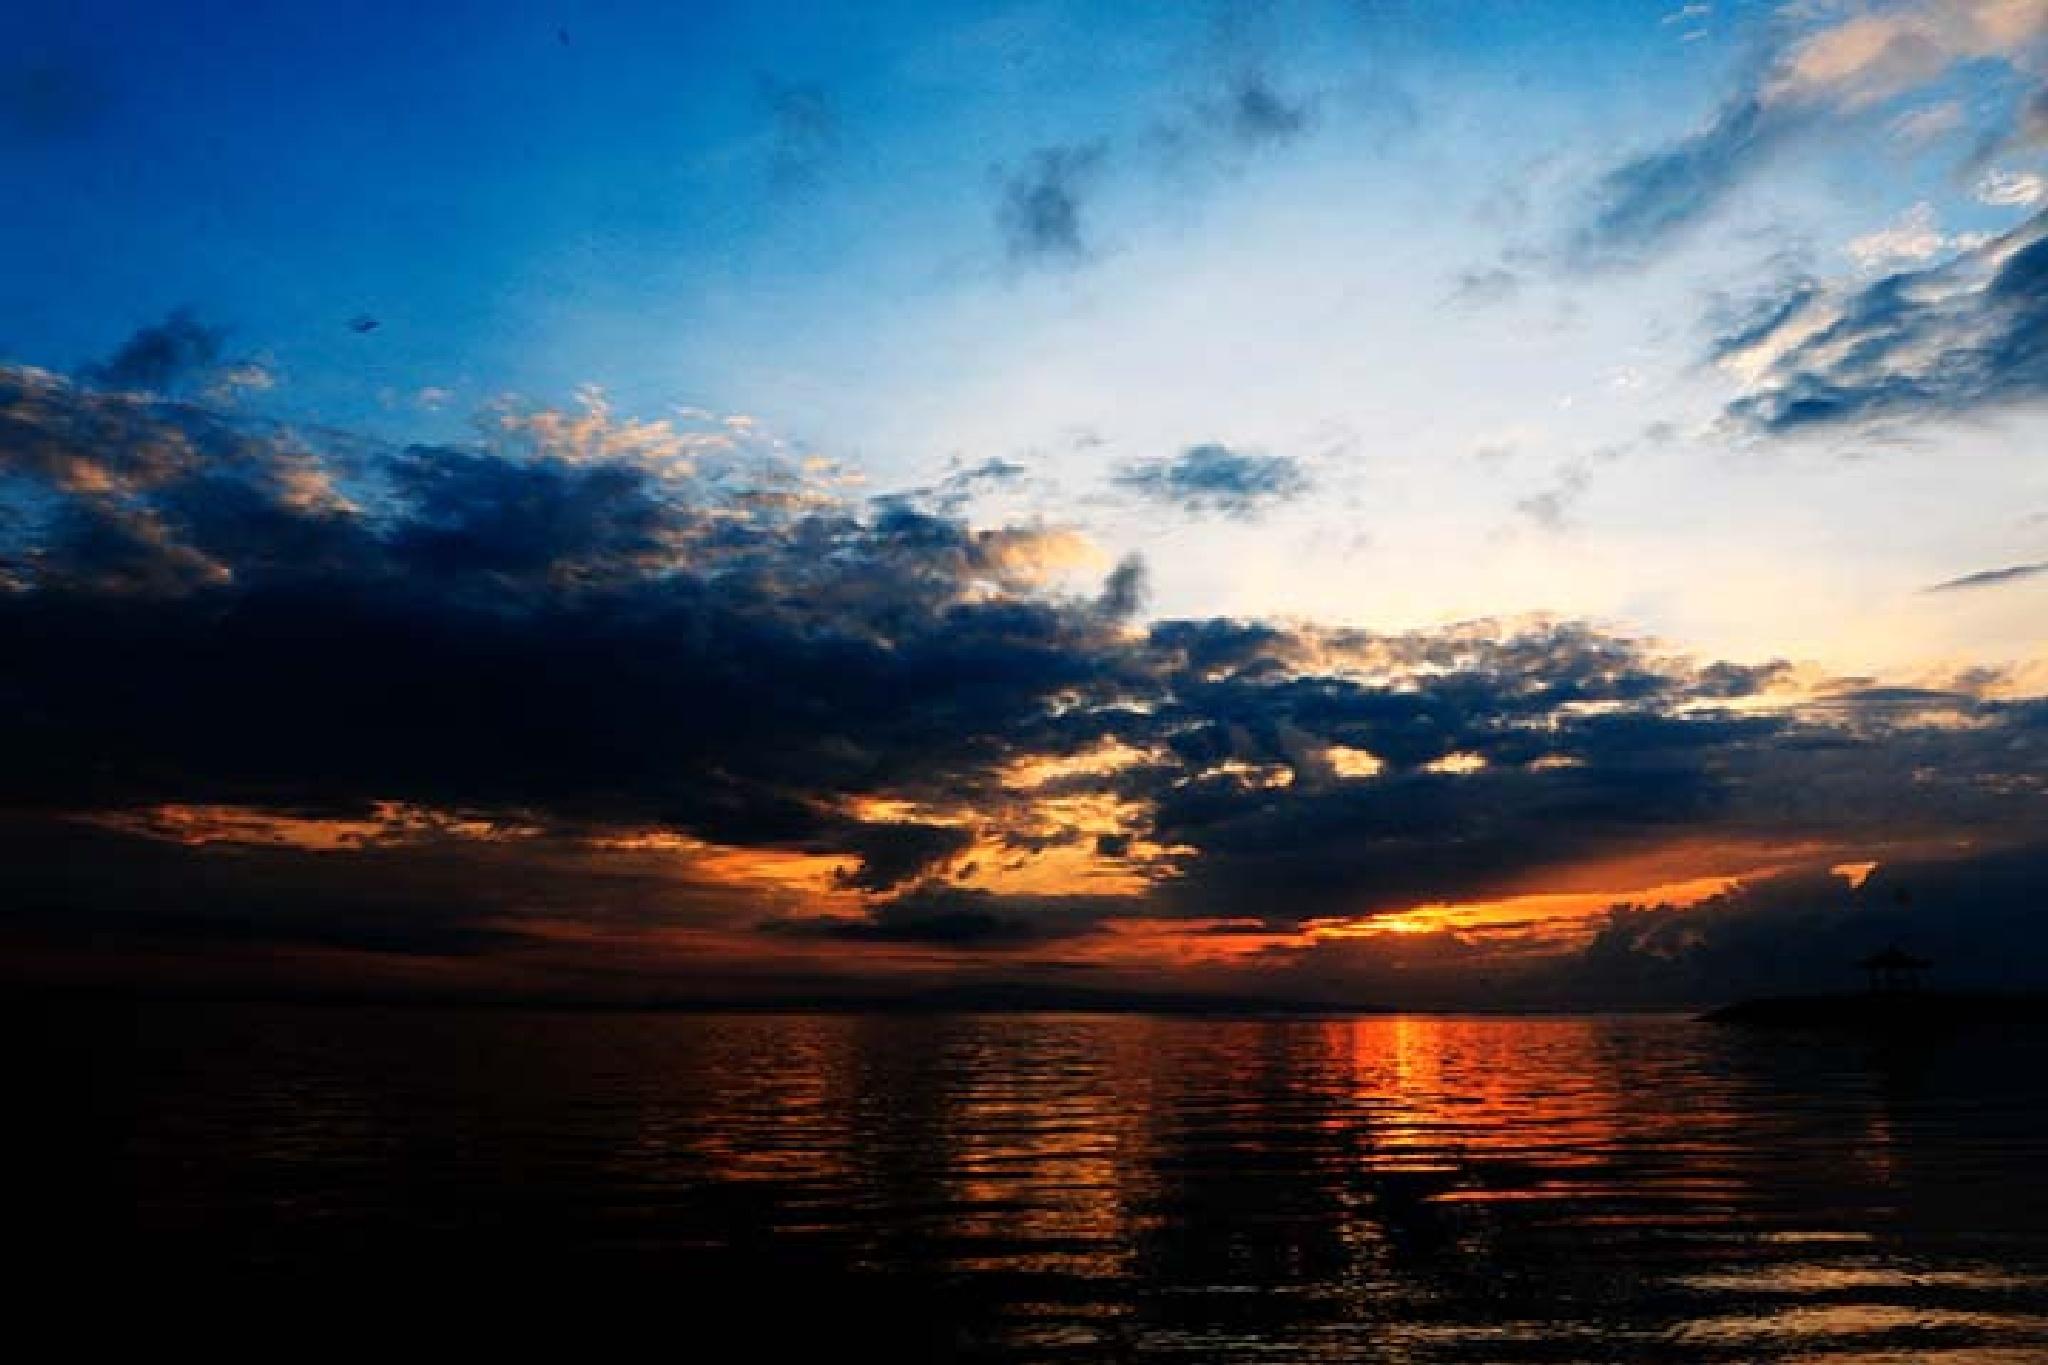 Matahari Terbit. by I Ketut Sukiana